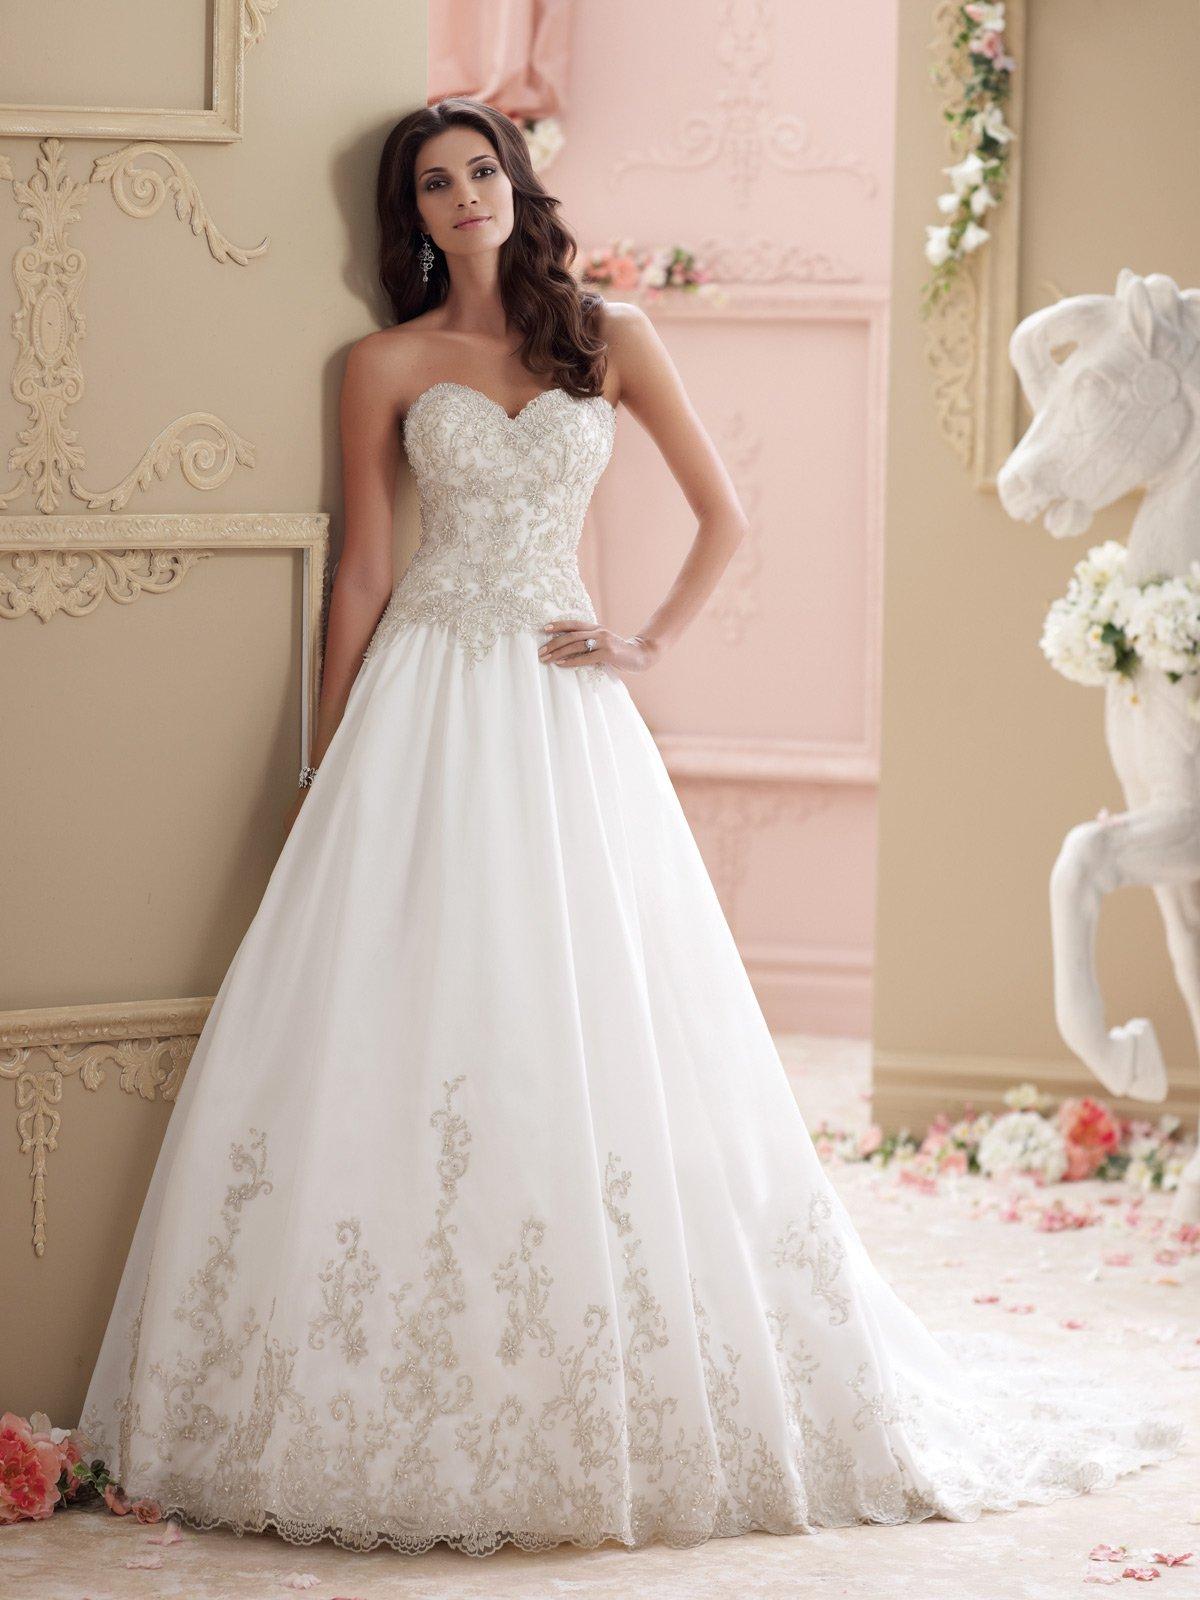 Best & Perfect Wedding Dress